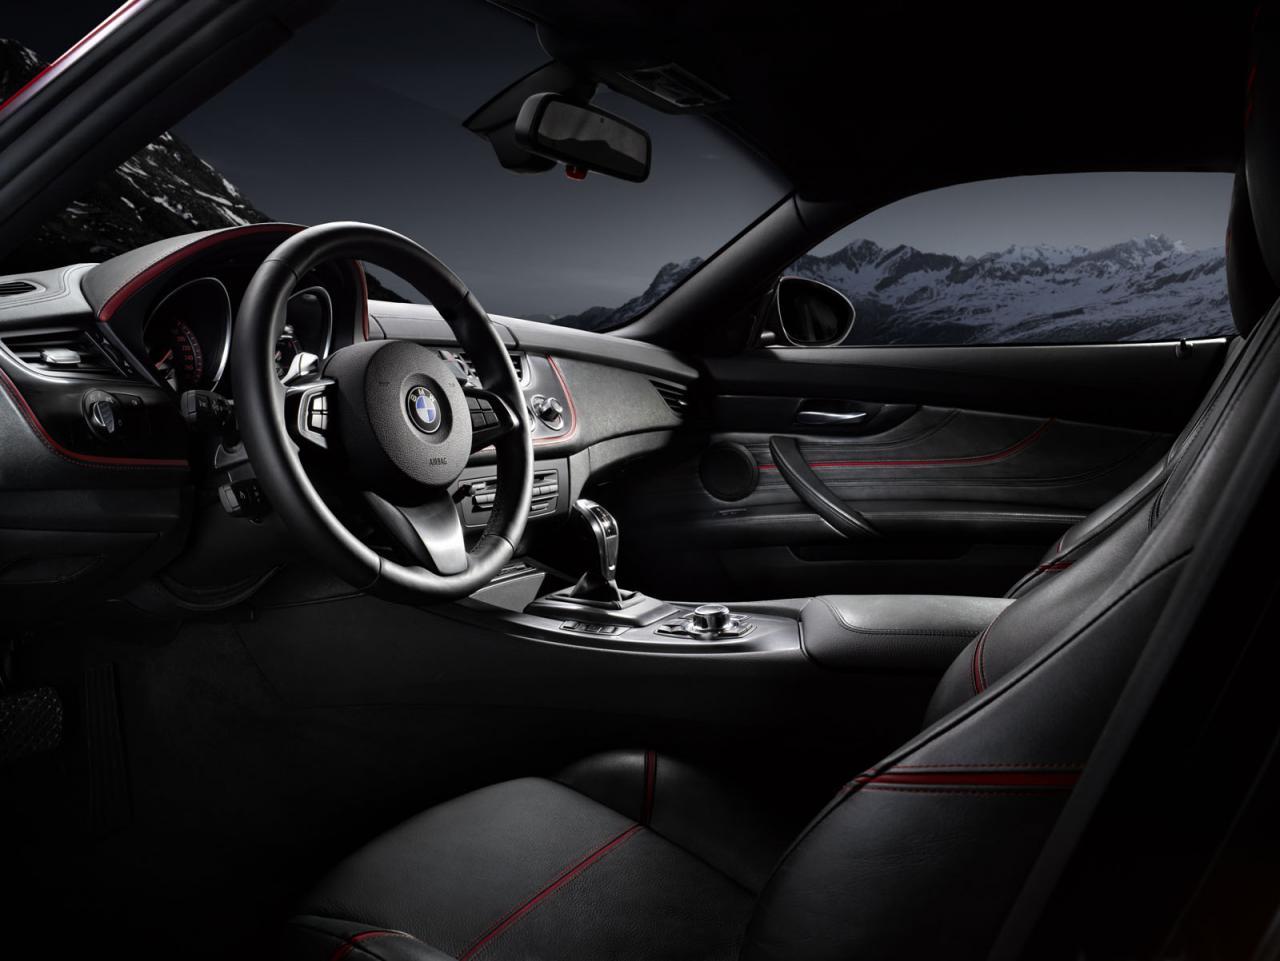 BMW+Zagato+Coup%C3%A9+3.jpg